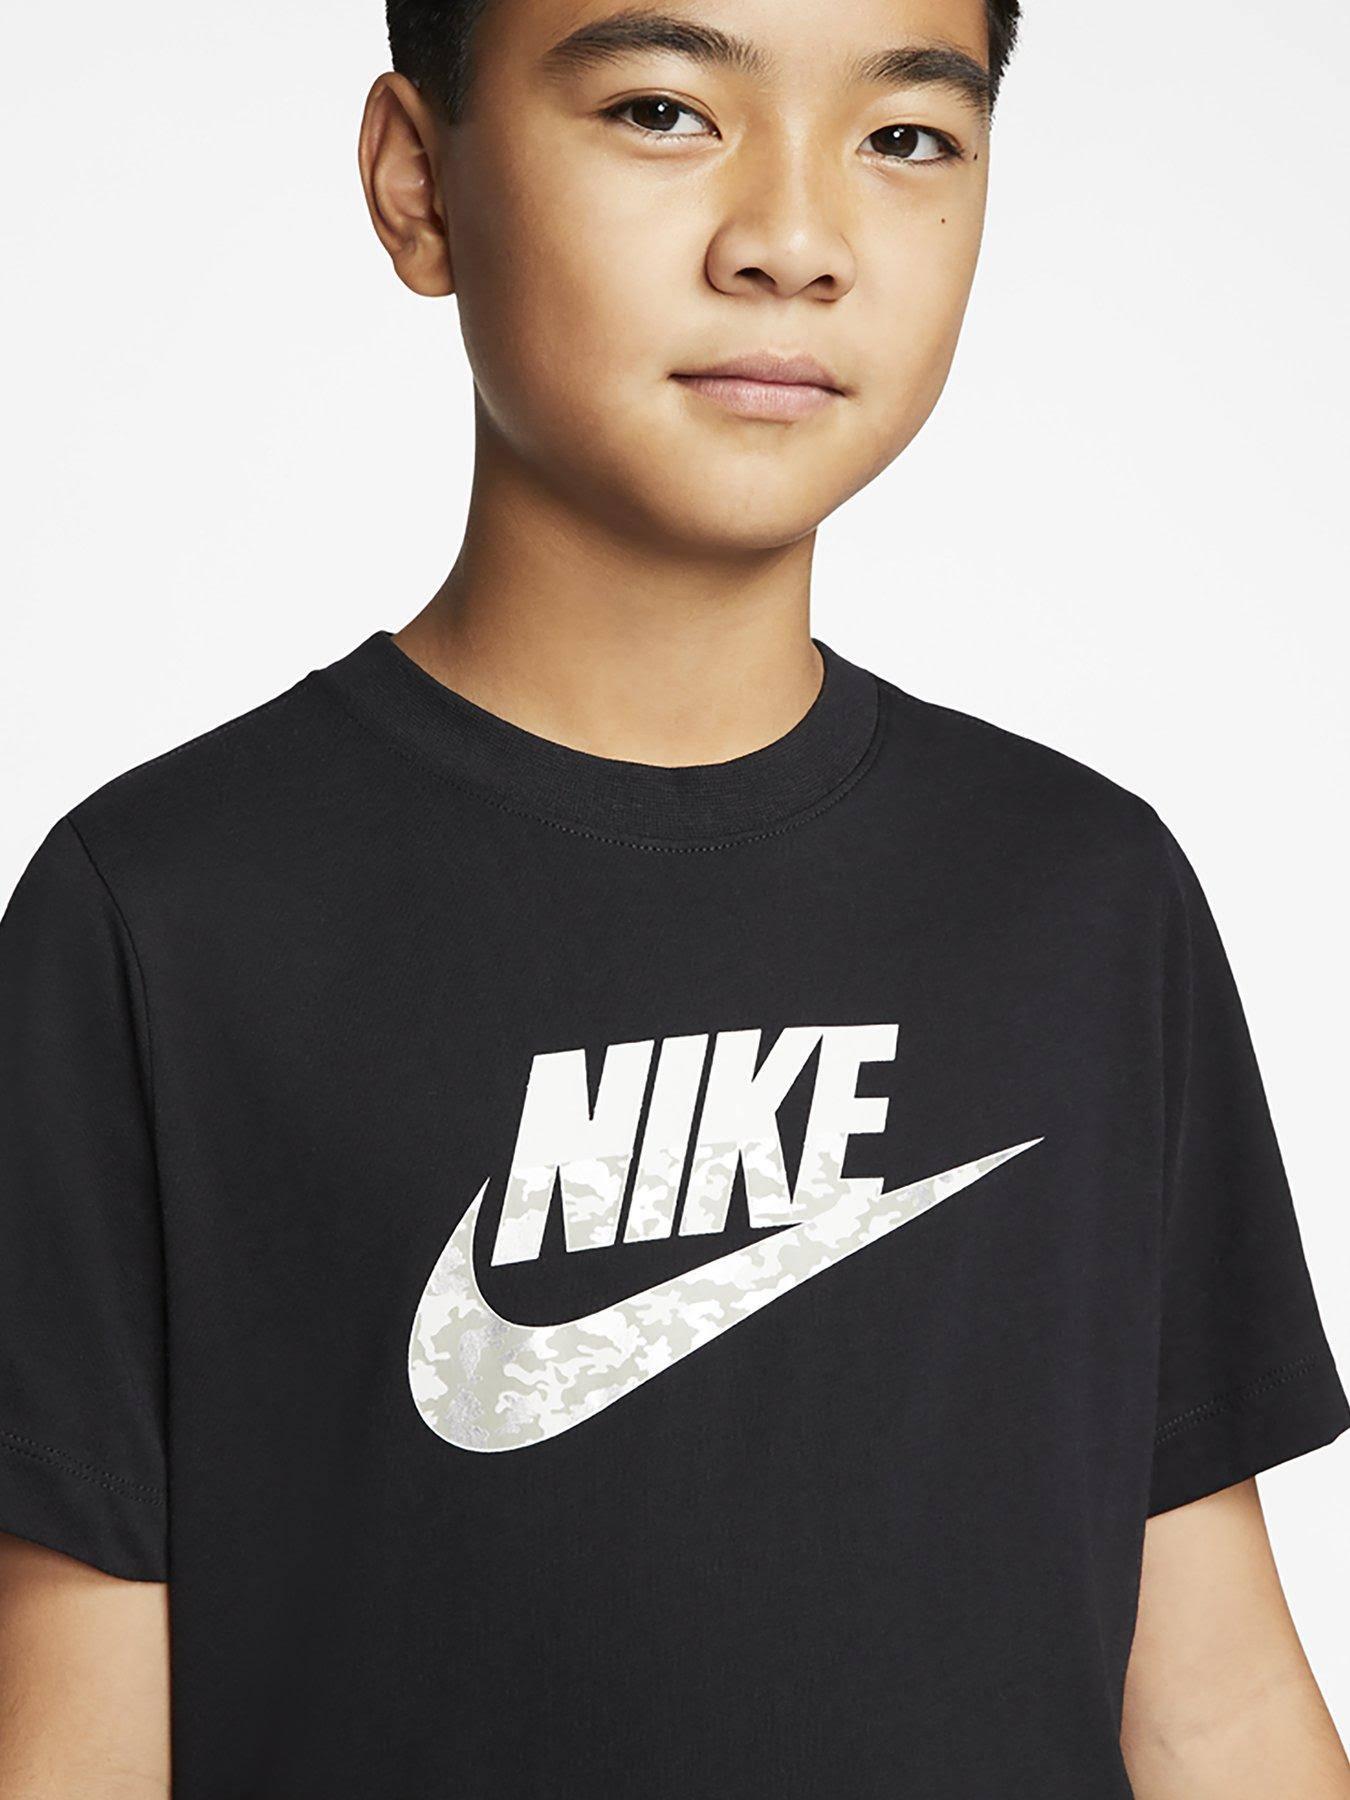 Nike Sportswear B NSW TEE Futura CAMO Print Tshirt, gender.teen.male, Size: 6-7y, Black